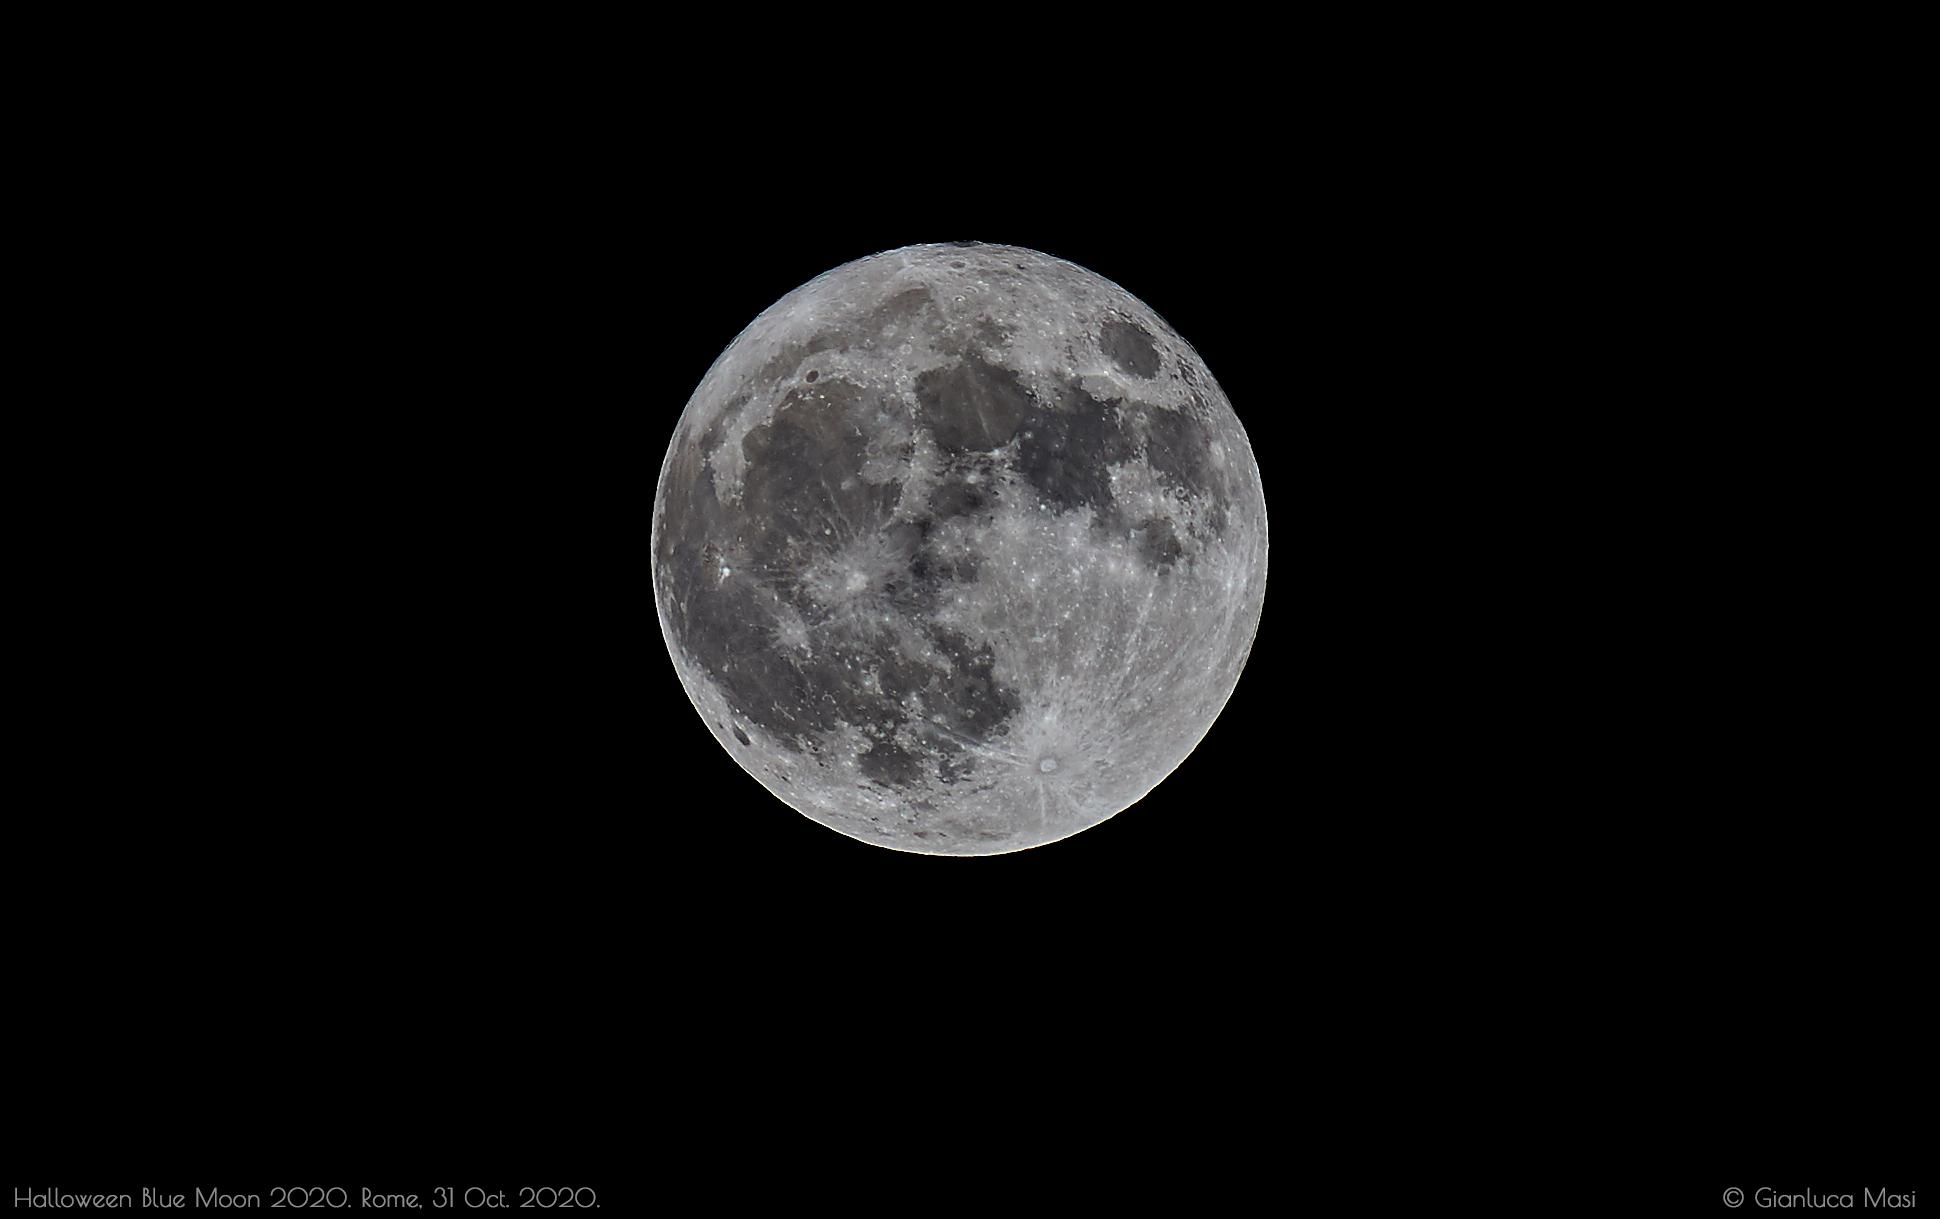 The Halloween Blue Moon 2020 at night.